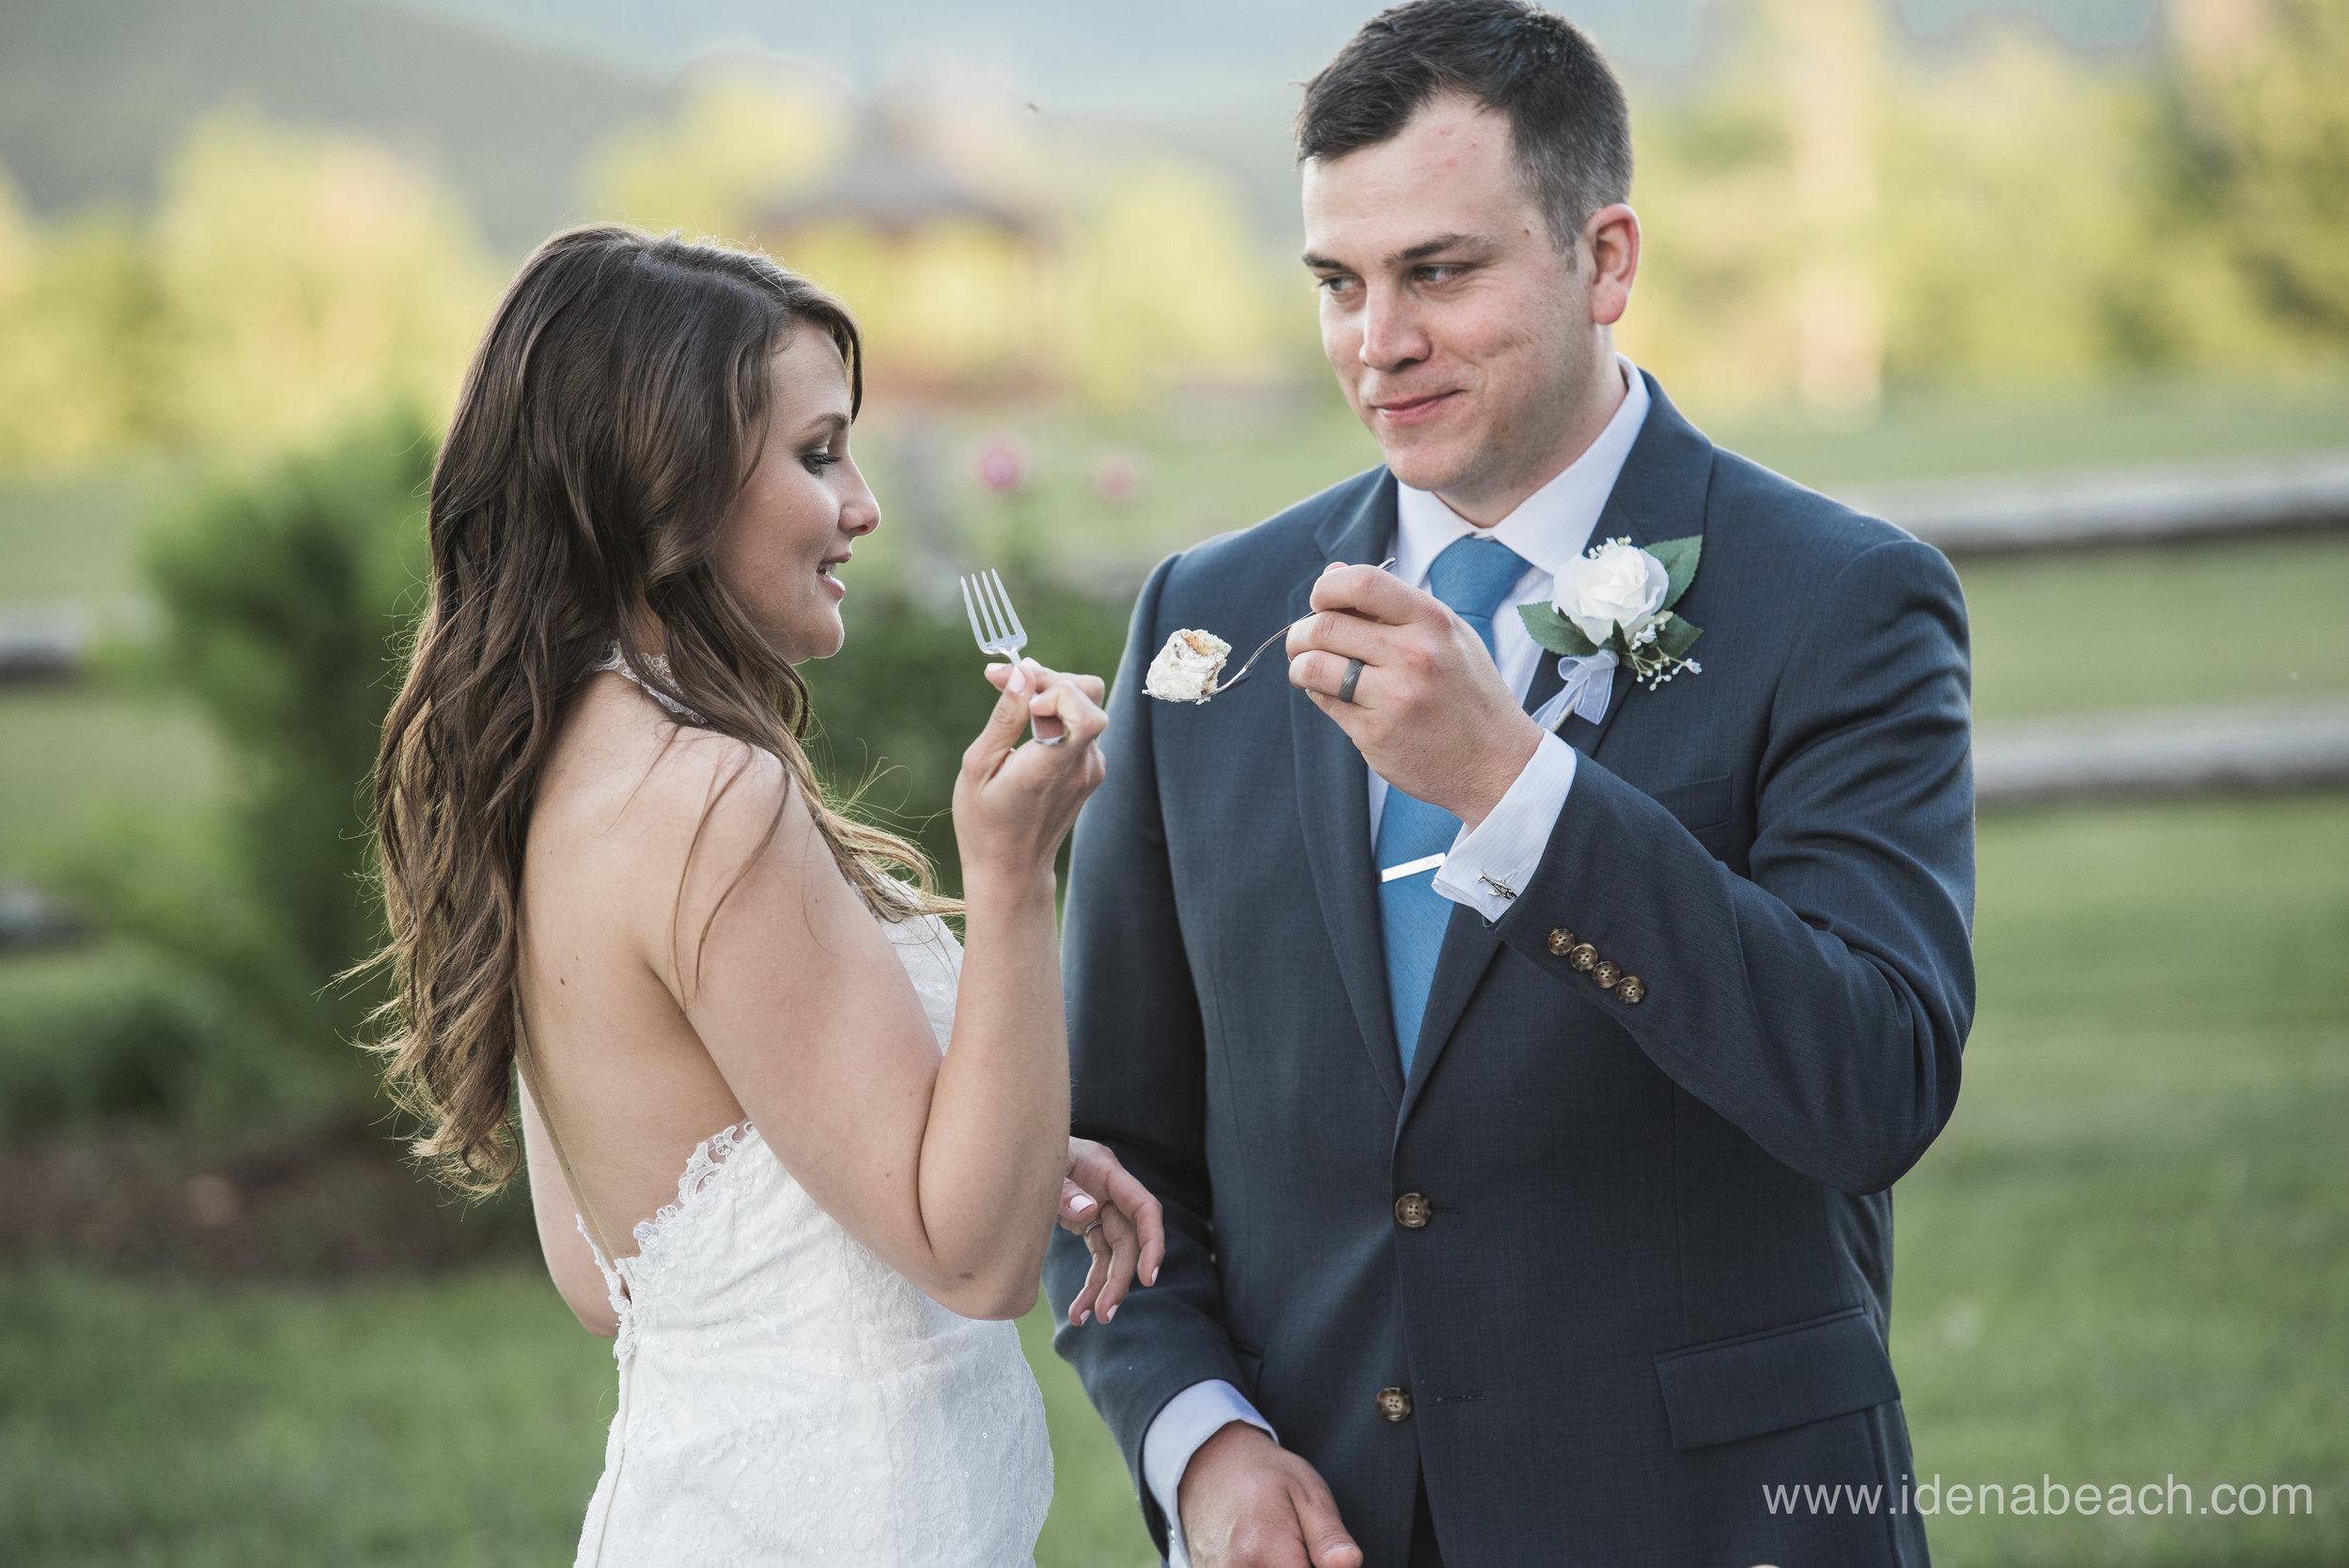 Mountain-Top-Inn-Vermont-Wedding-Photographer-127.jpg